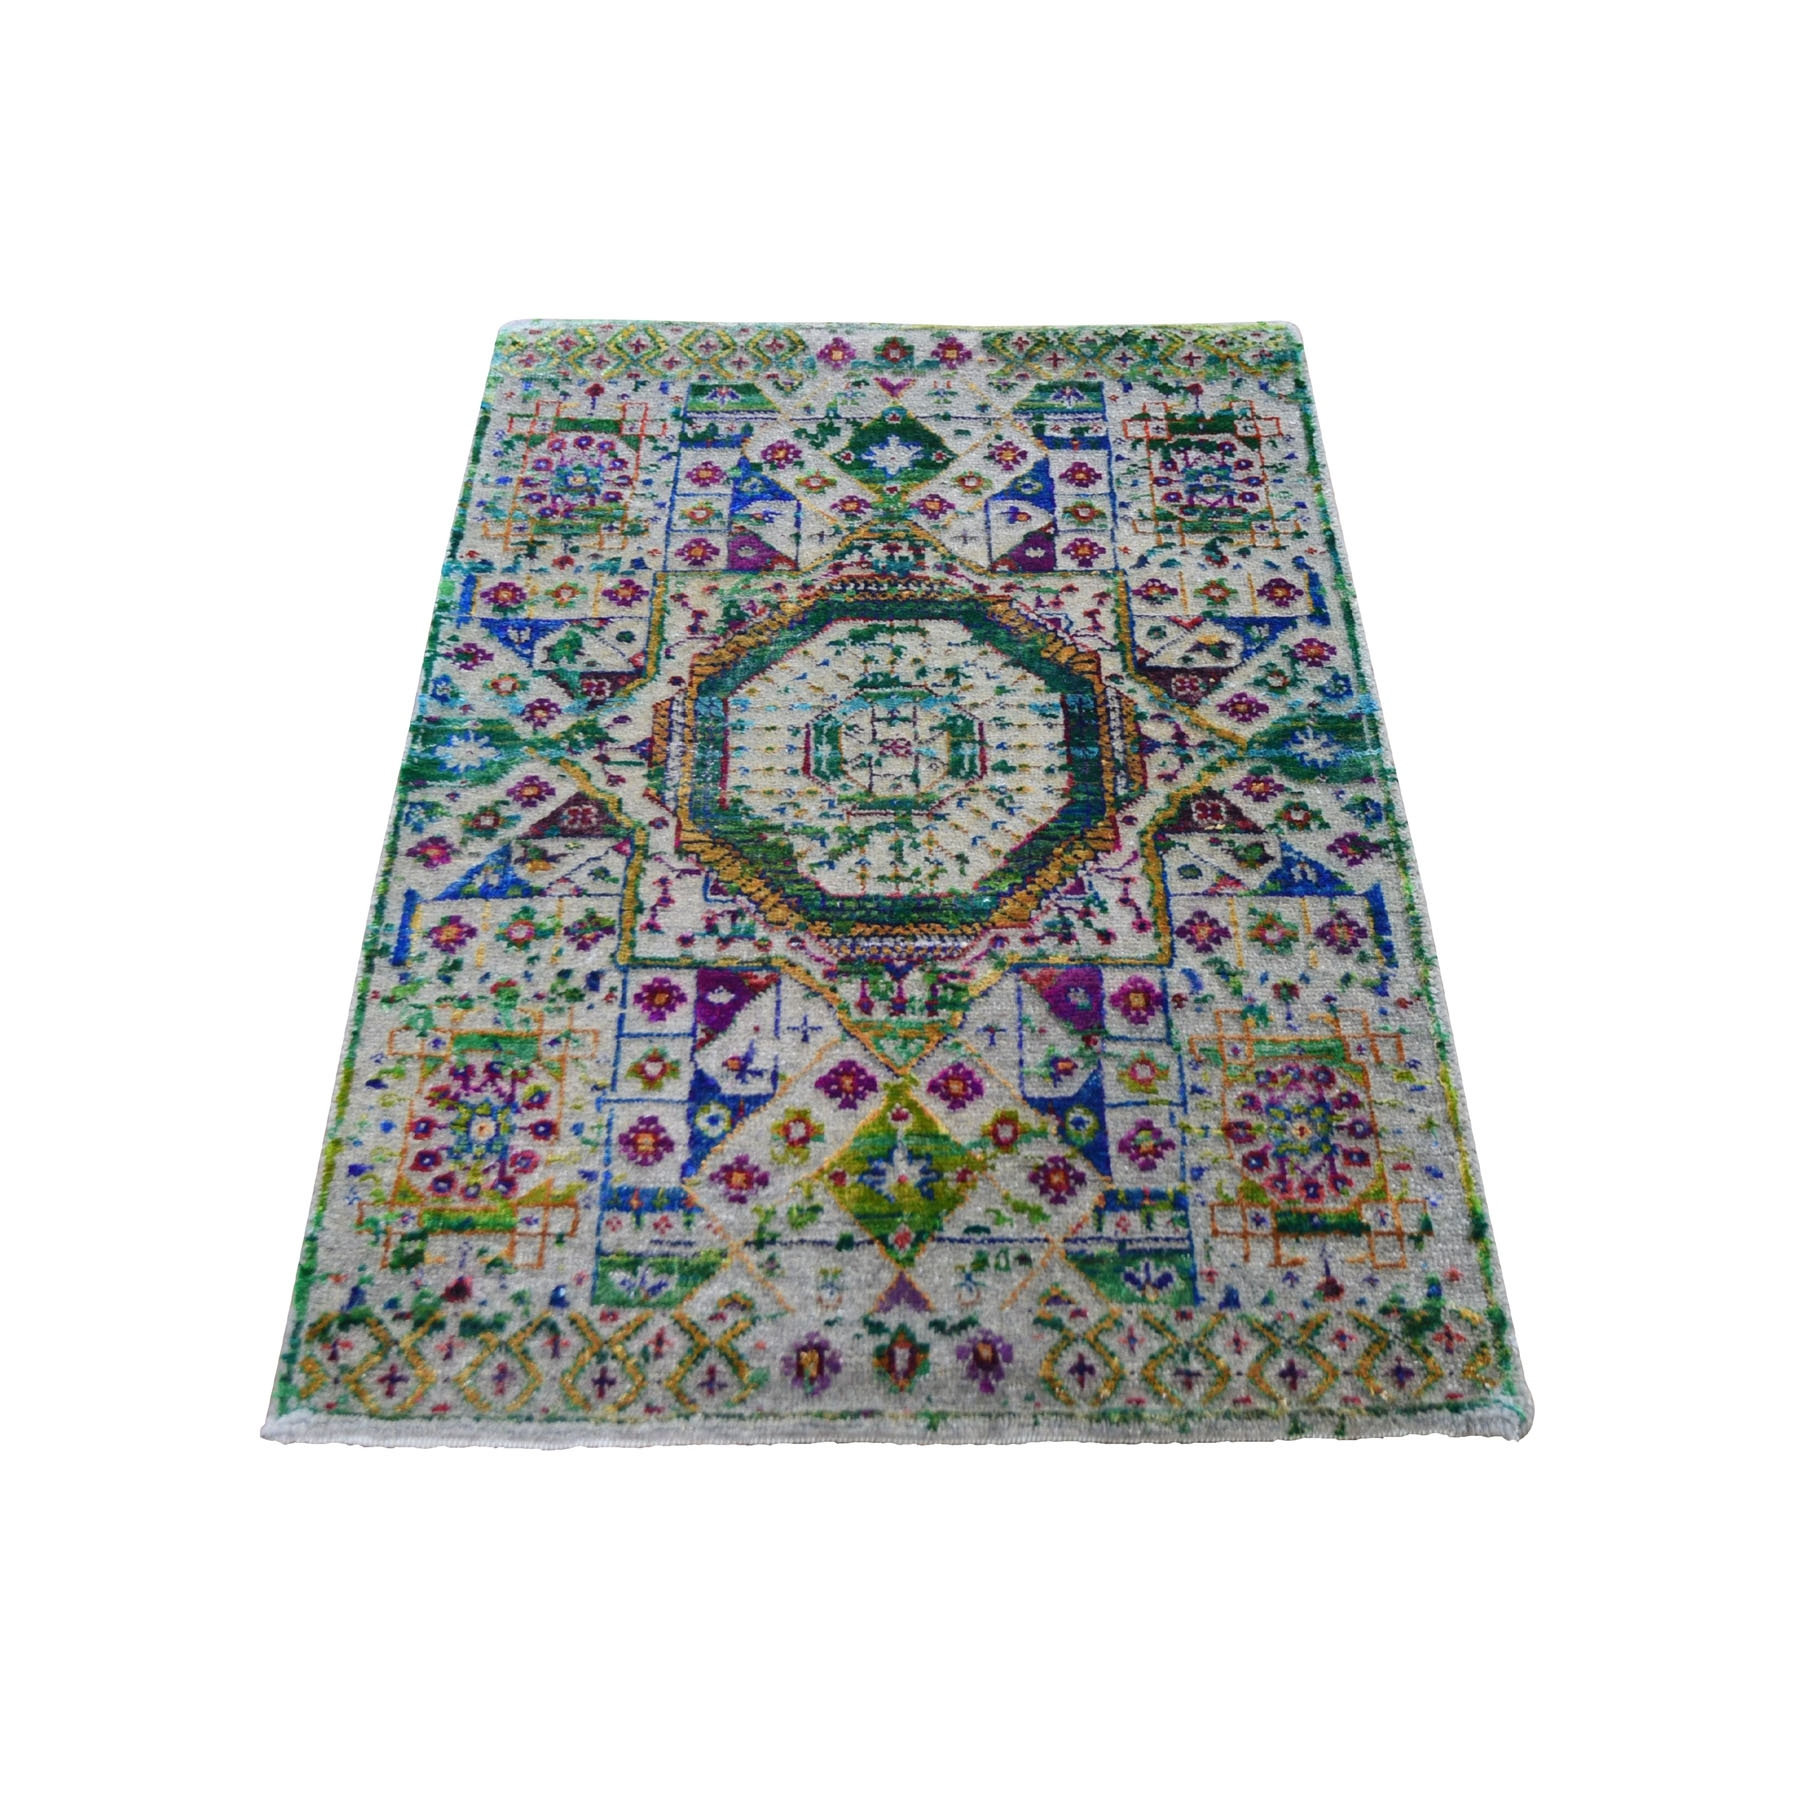 "2'1""X3' Colorful Sari Silk Mamluk Design Hand Knotted Oriental Rug moad8990"